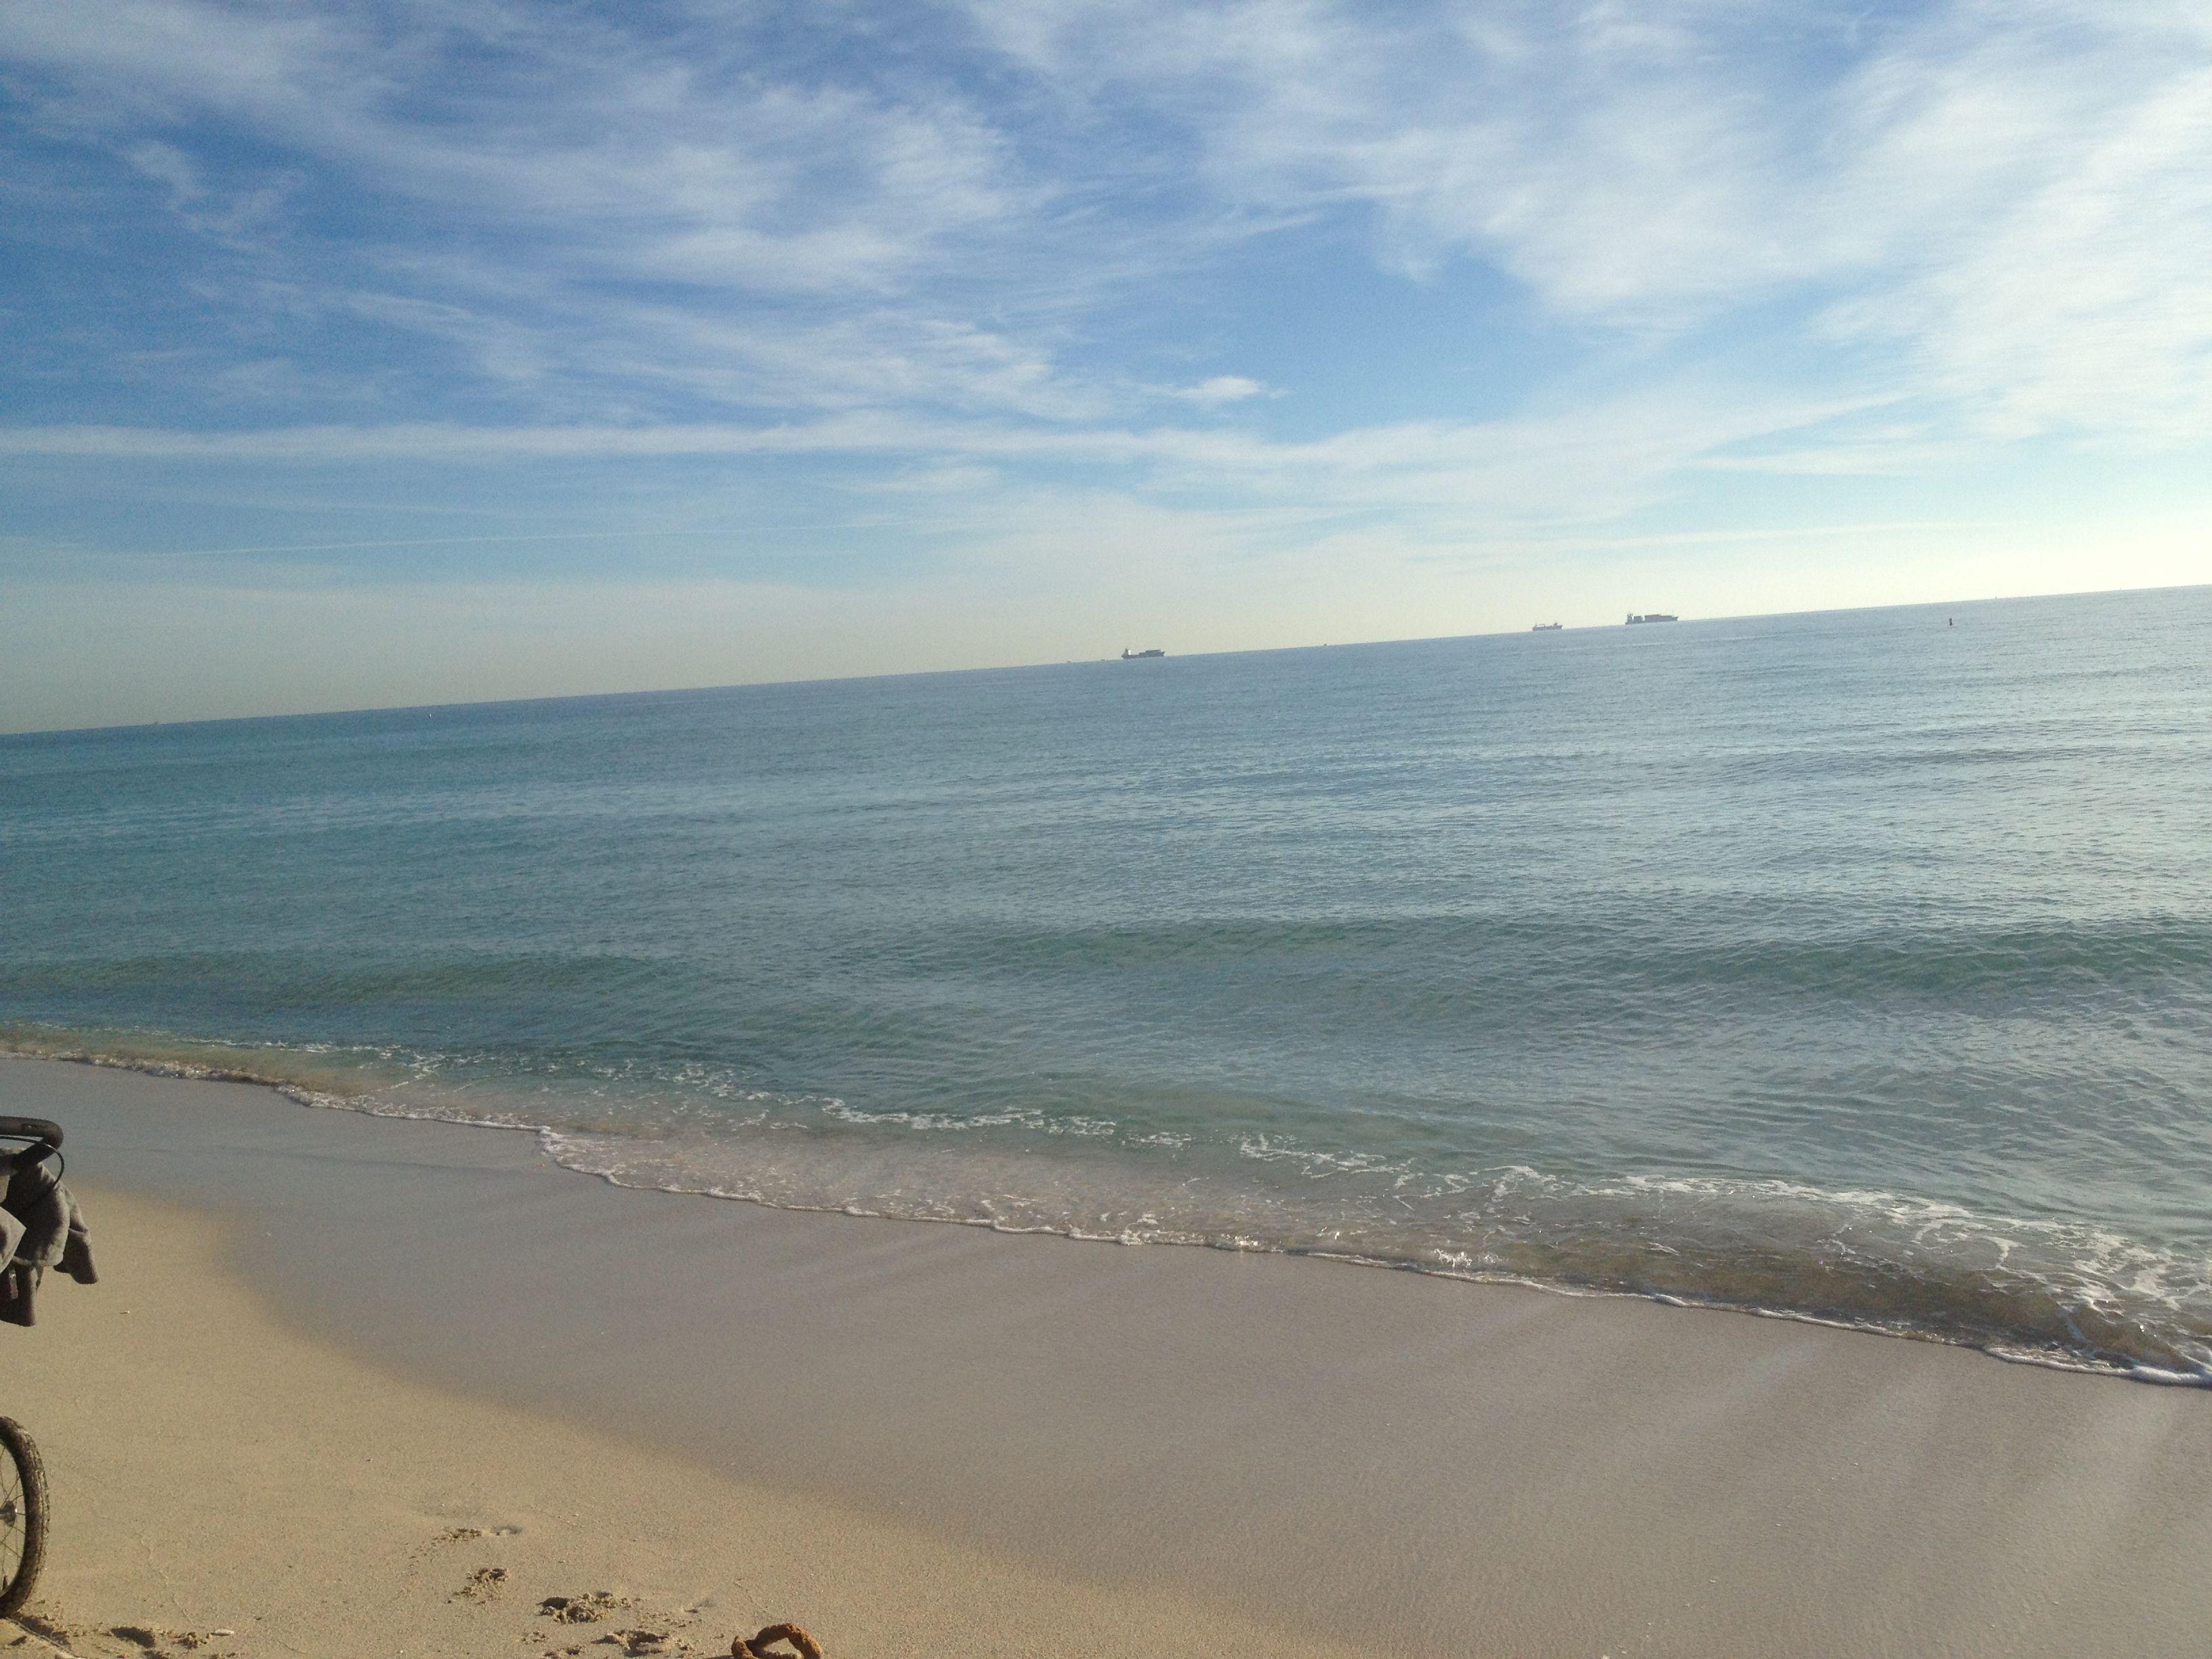 Miami Beach Miami beach, Beach, South beach